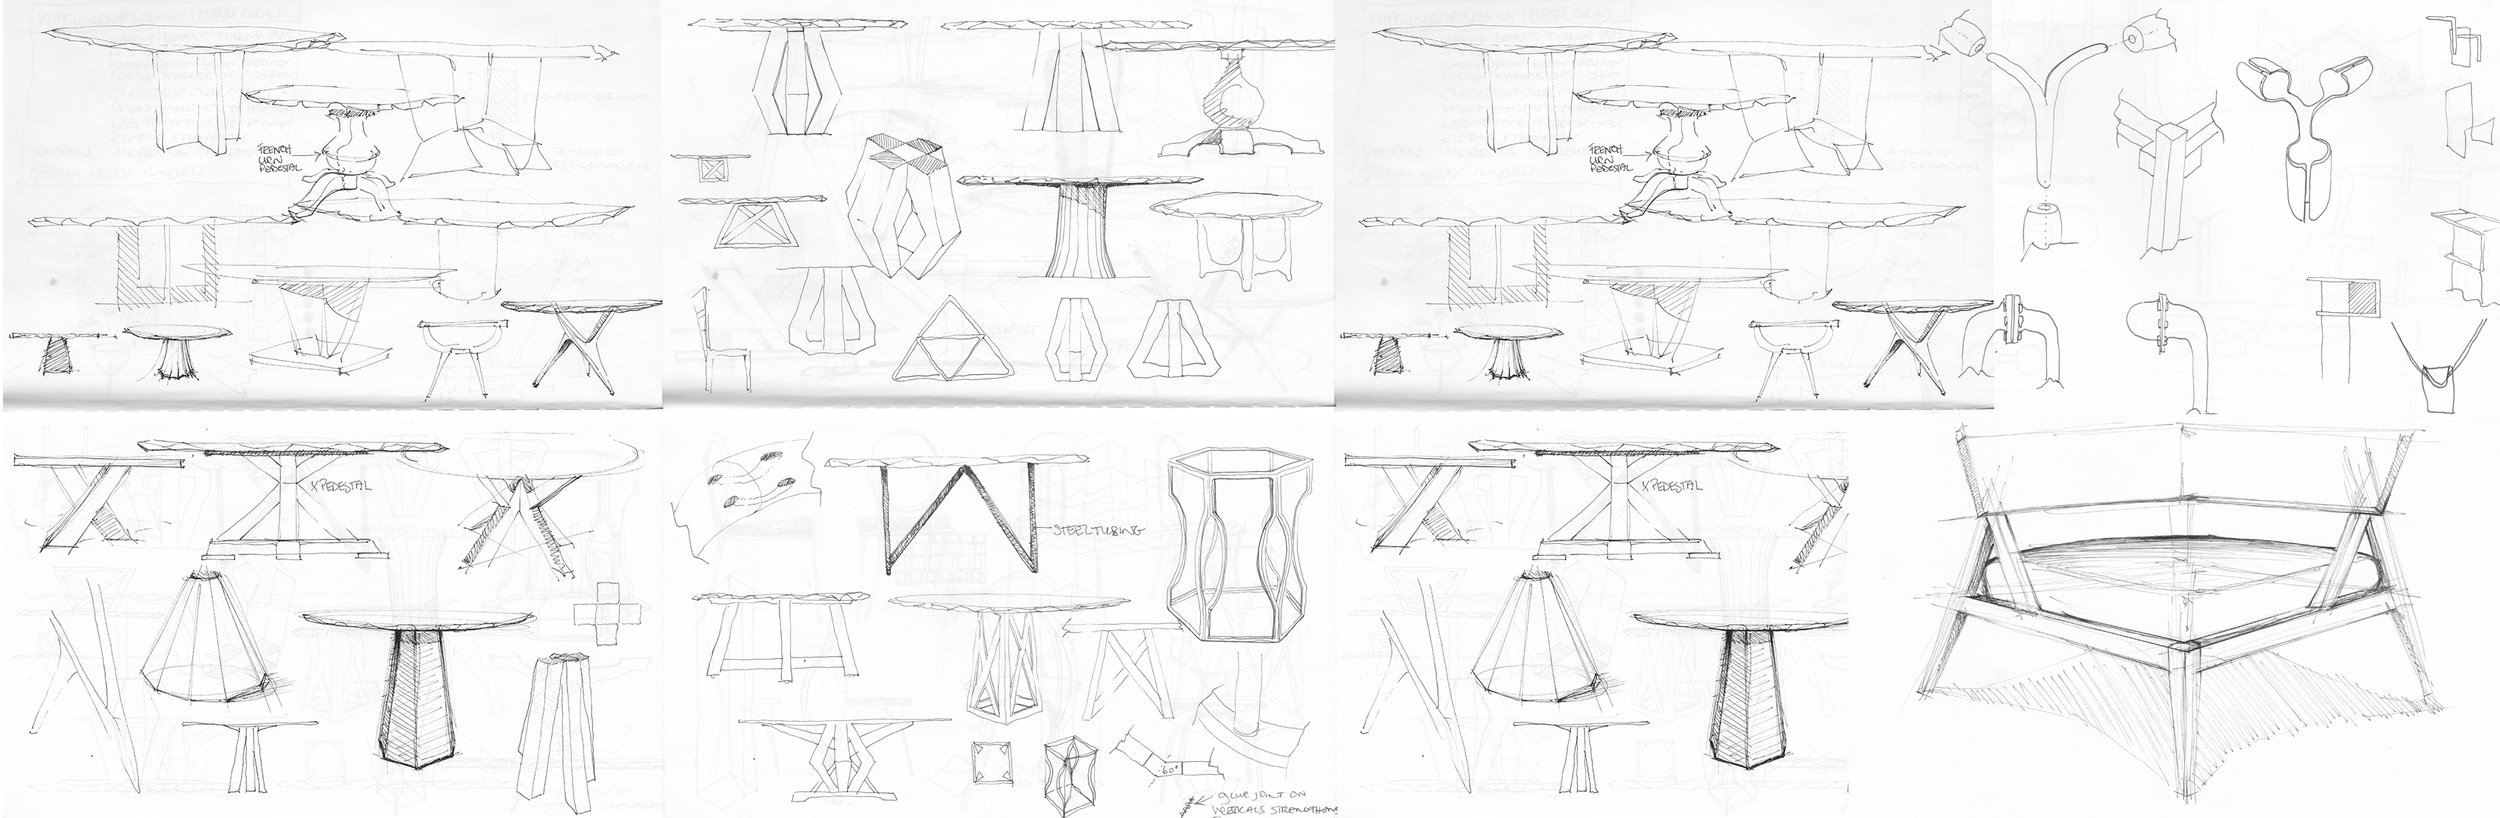 mb studio sketch sequence.jpg